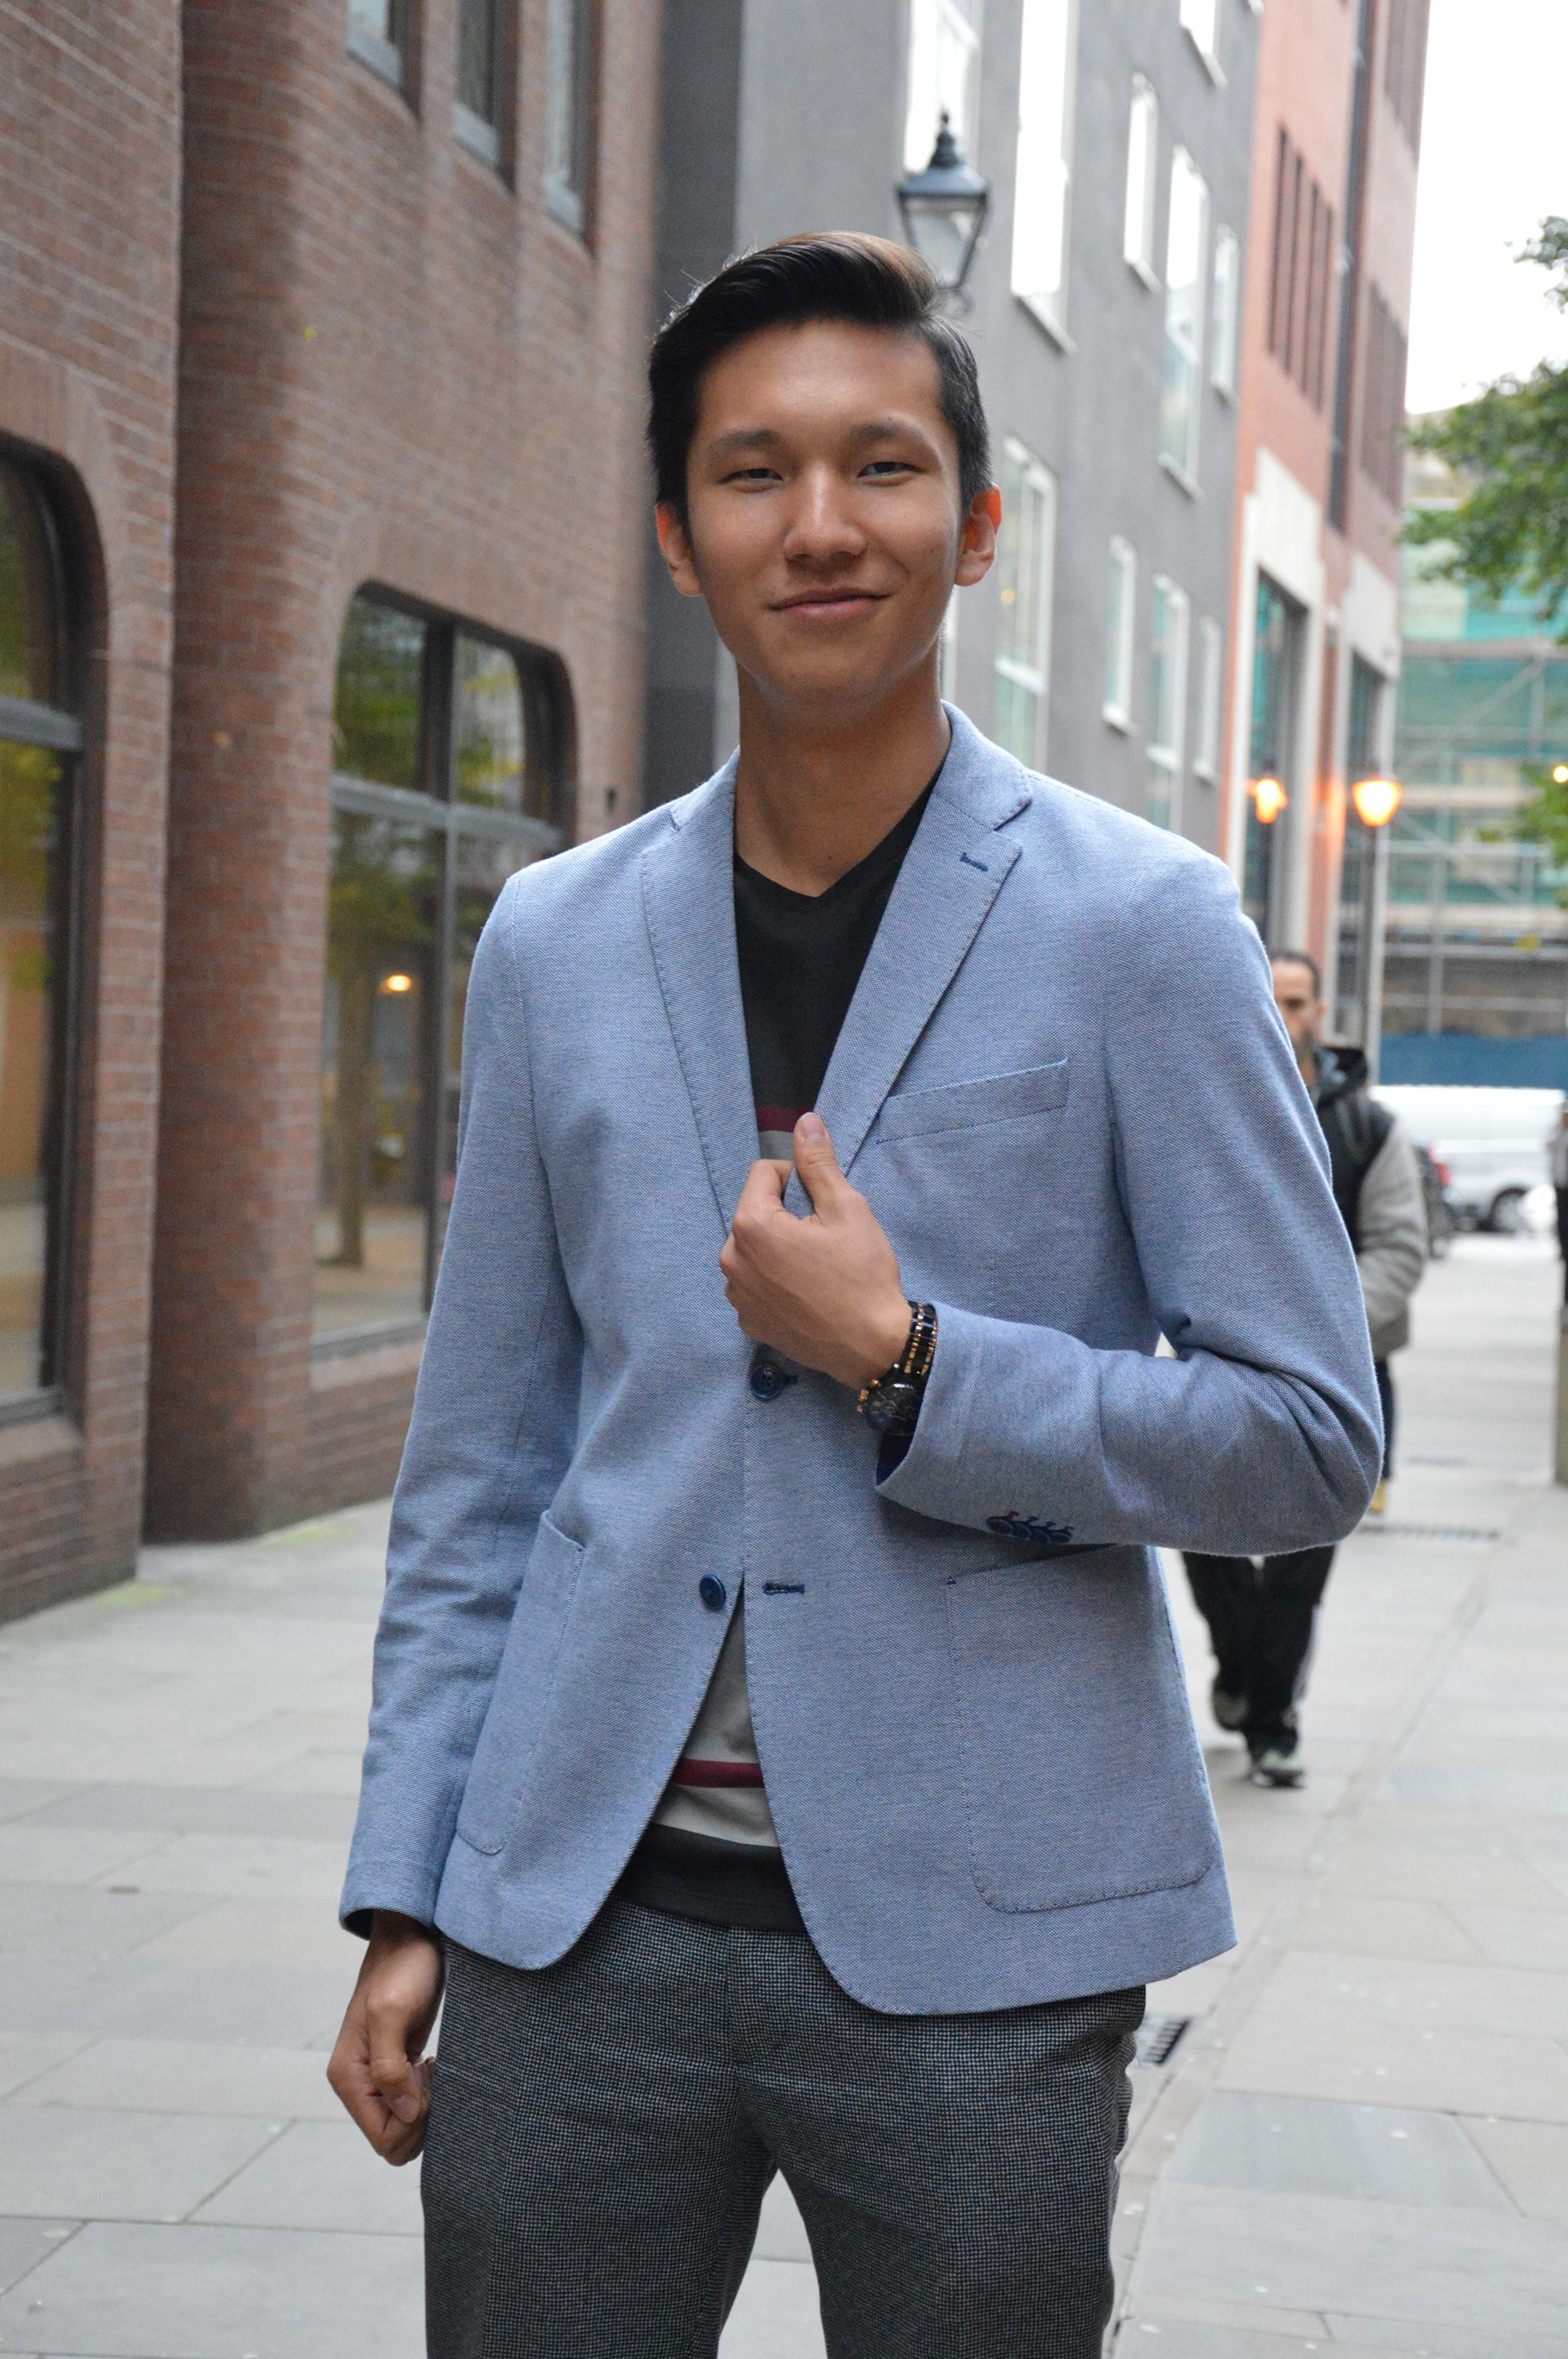 Photo of international student Aibar at INTO London